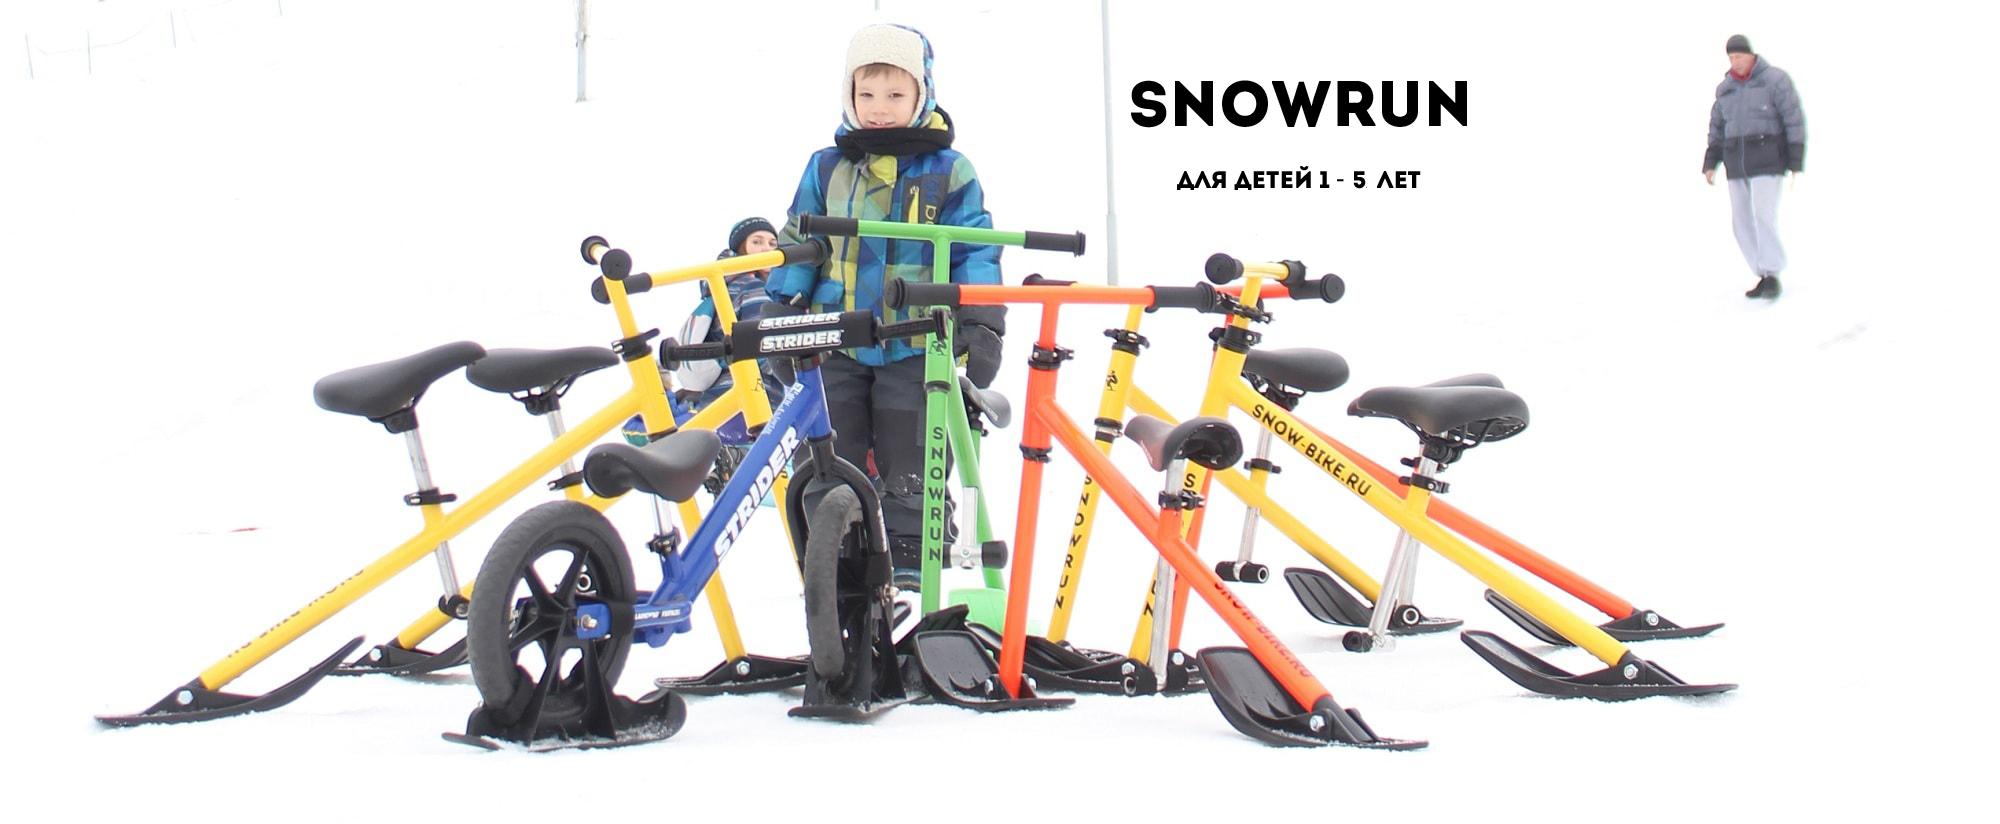 snowRUN_3_1